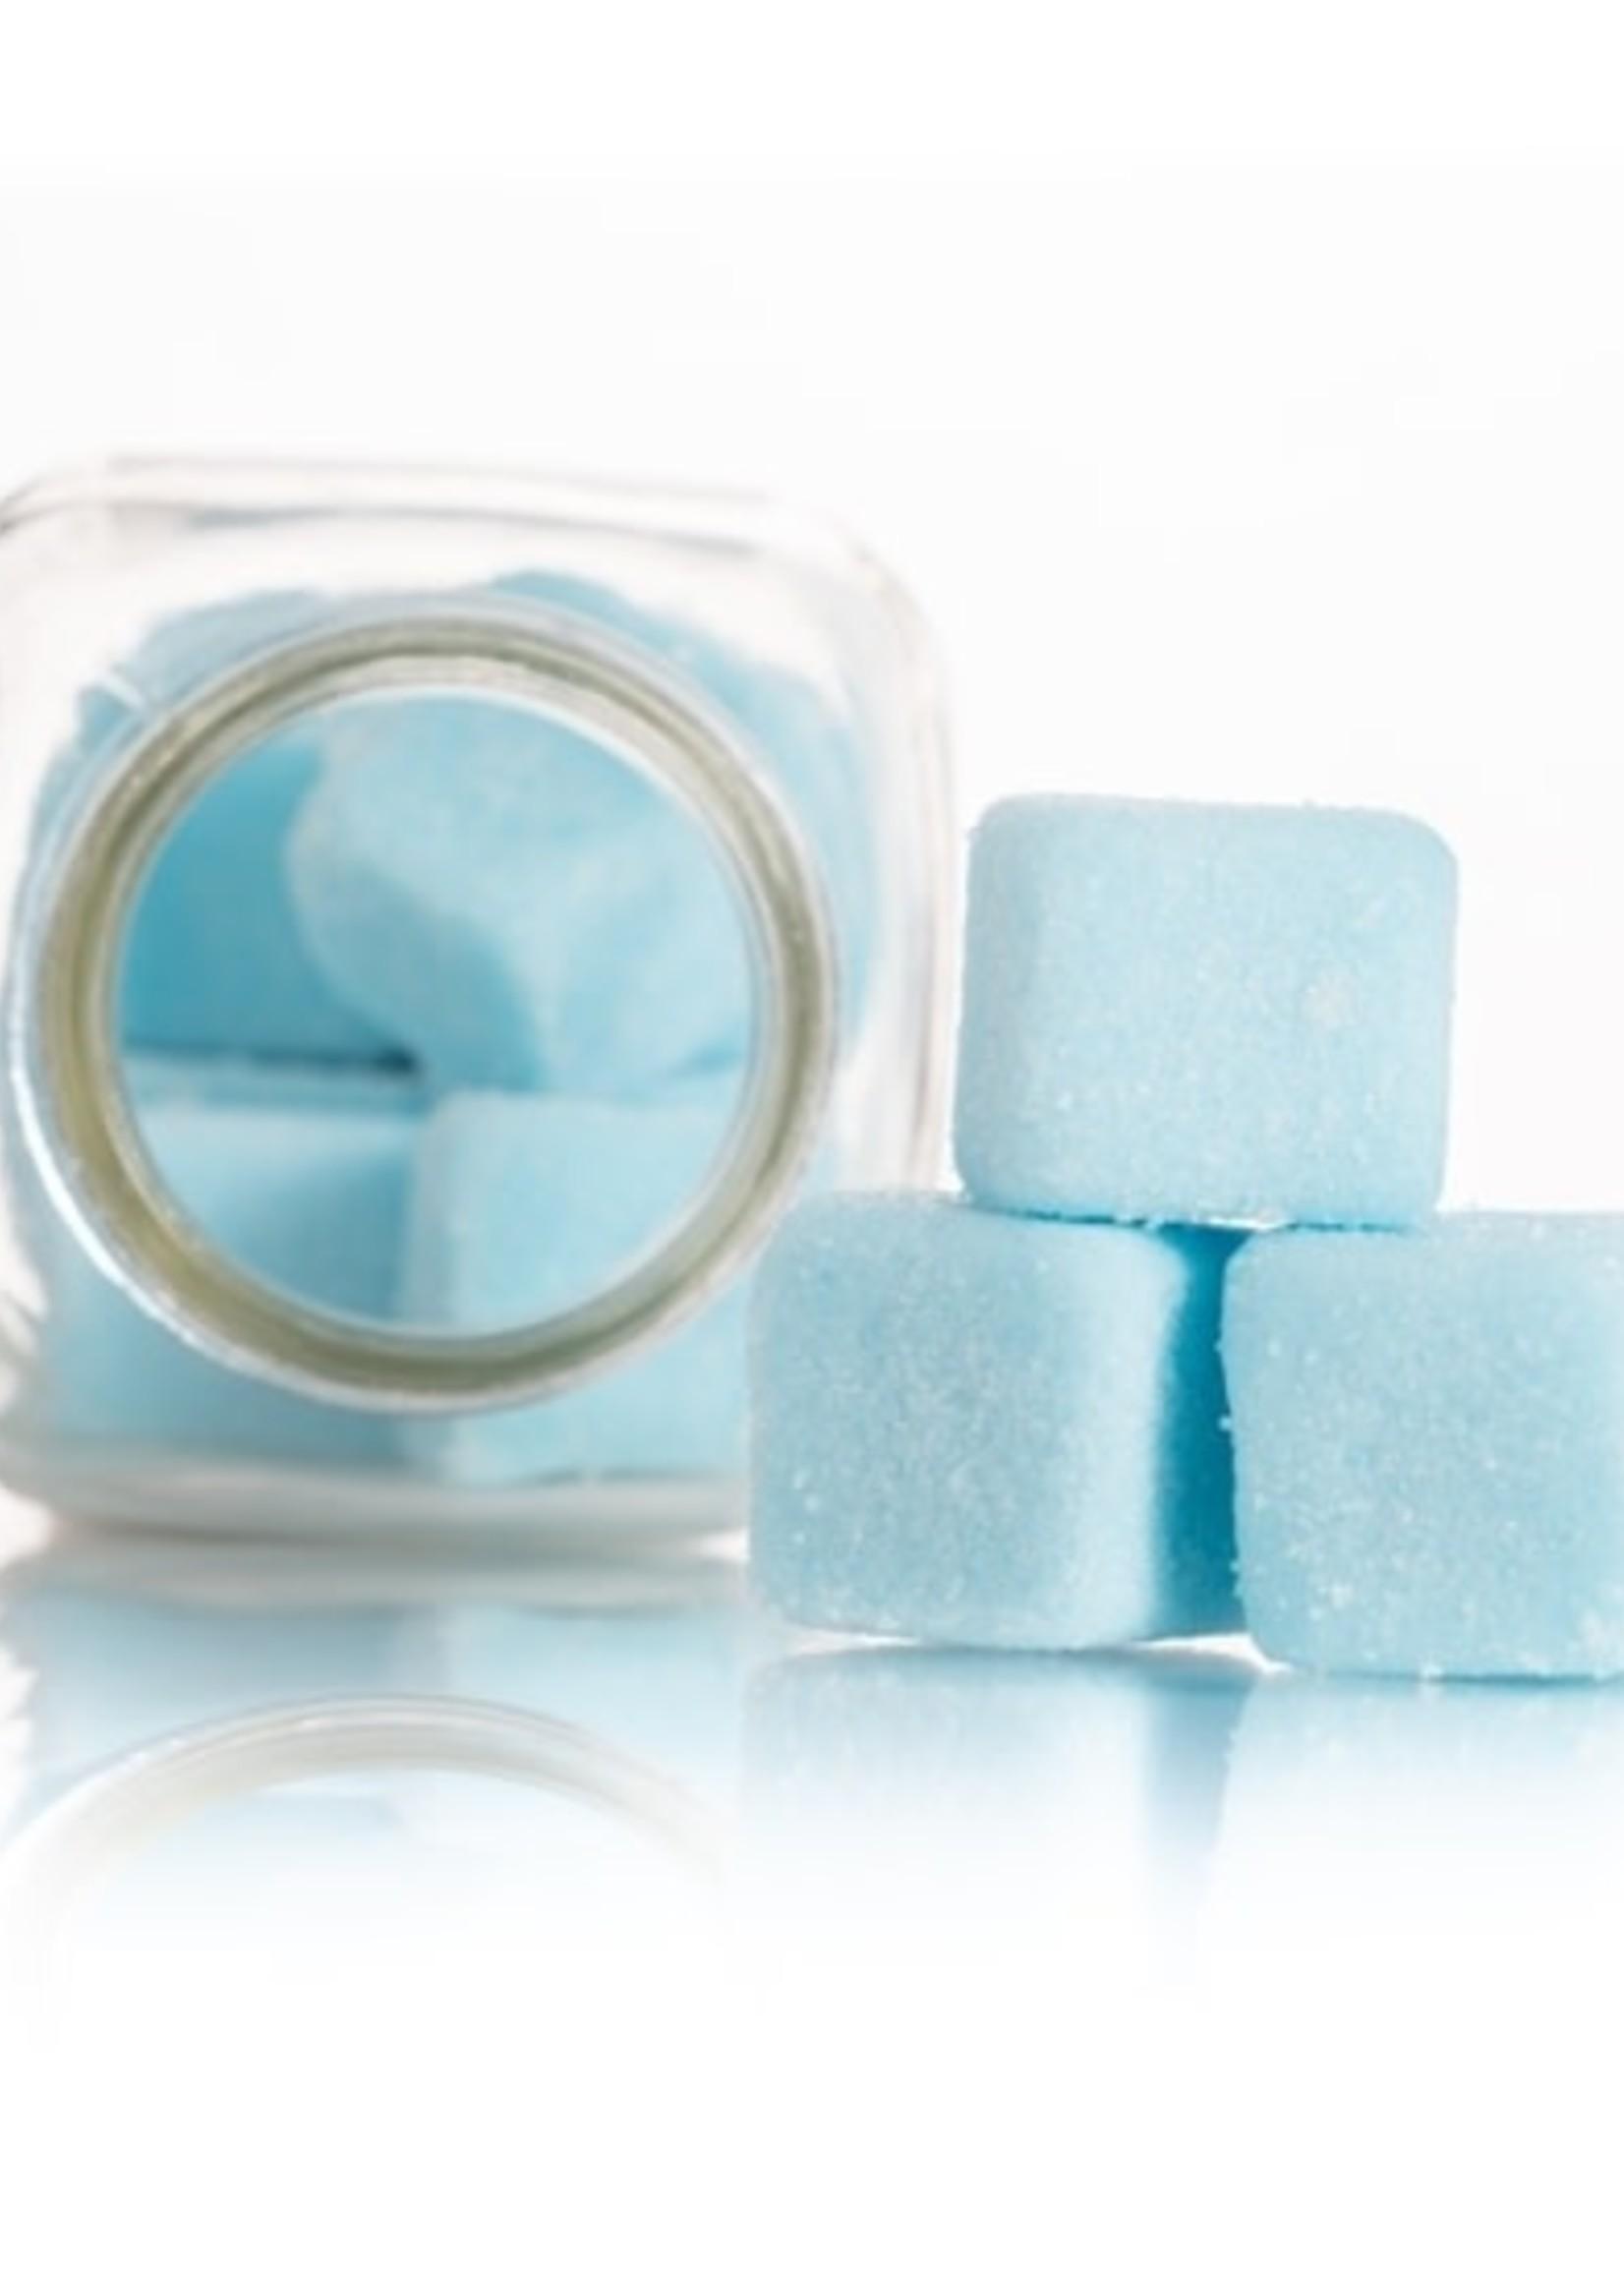 Harper + Ari Sugar Cubes